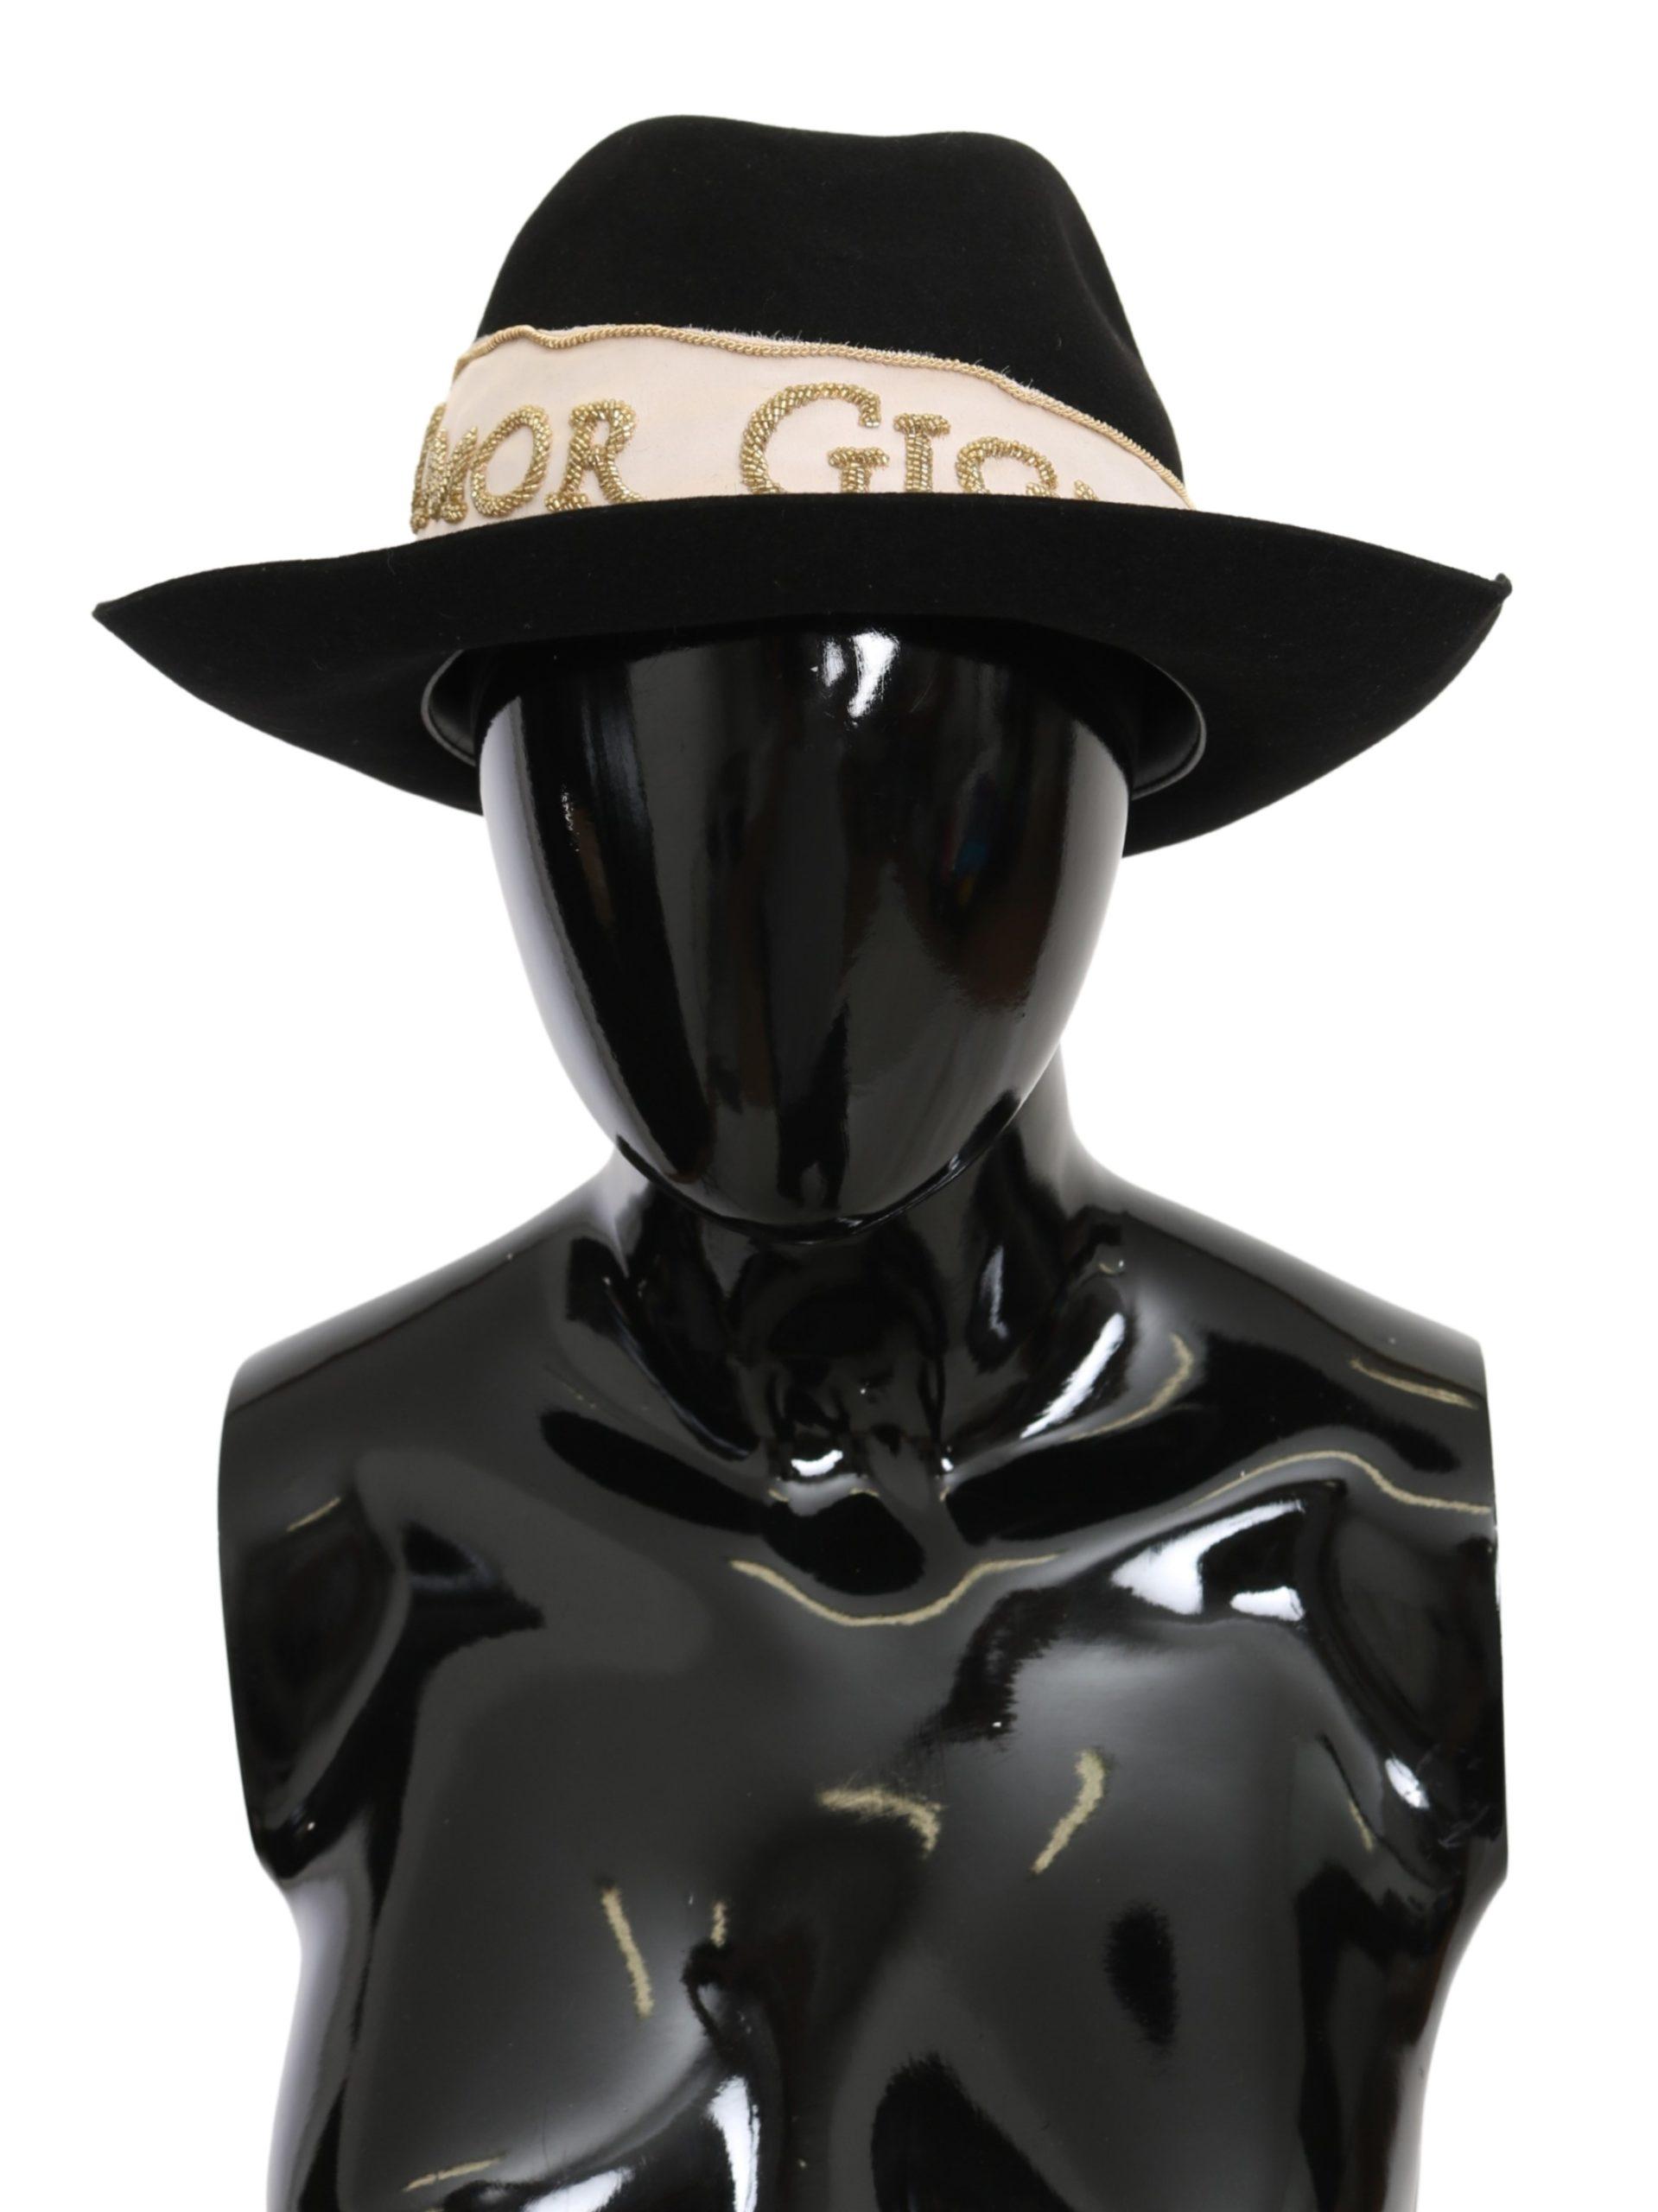 Dolce & Gabbana Men's Lapin Amor Gignit Fedora Hat Black HAT9101 - 57 cm|S